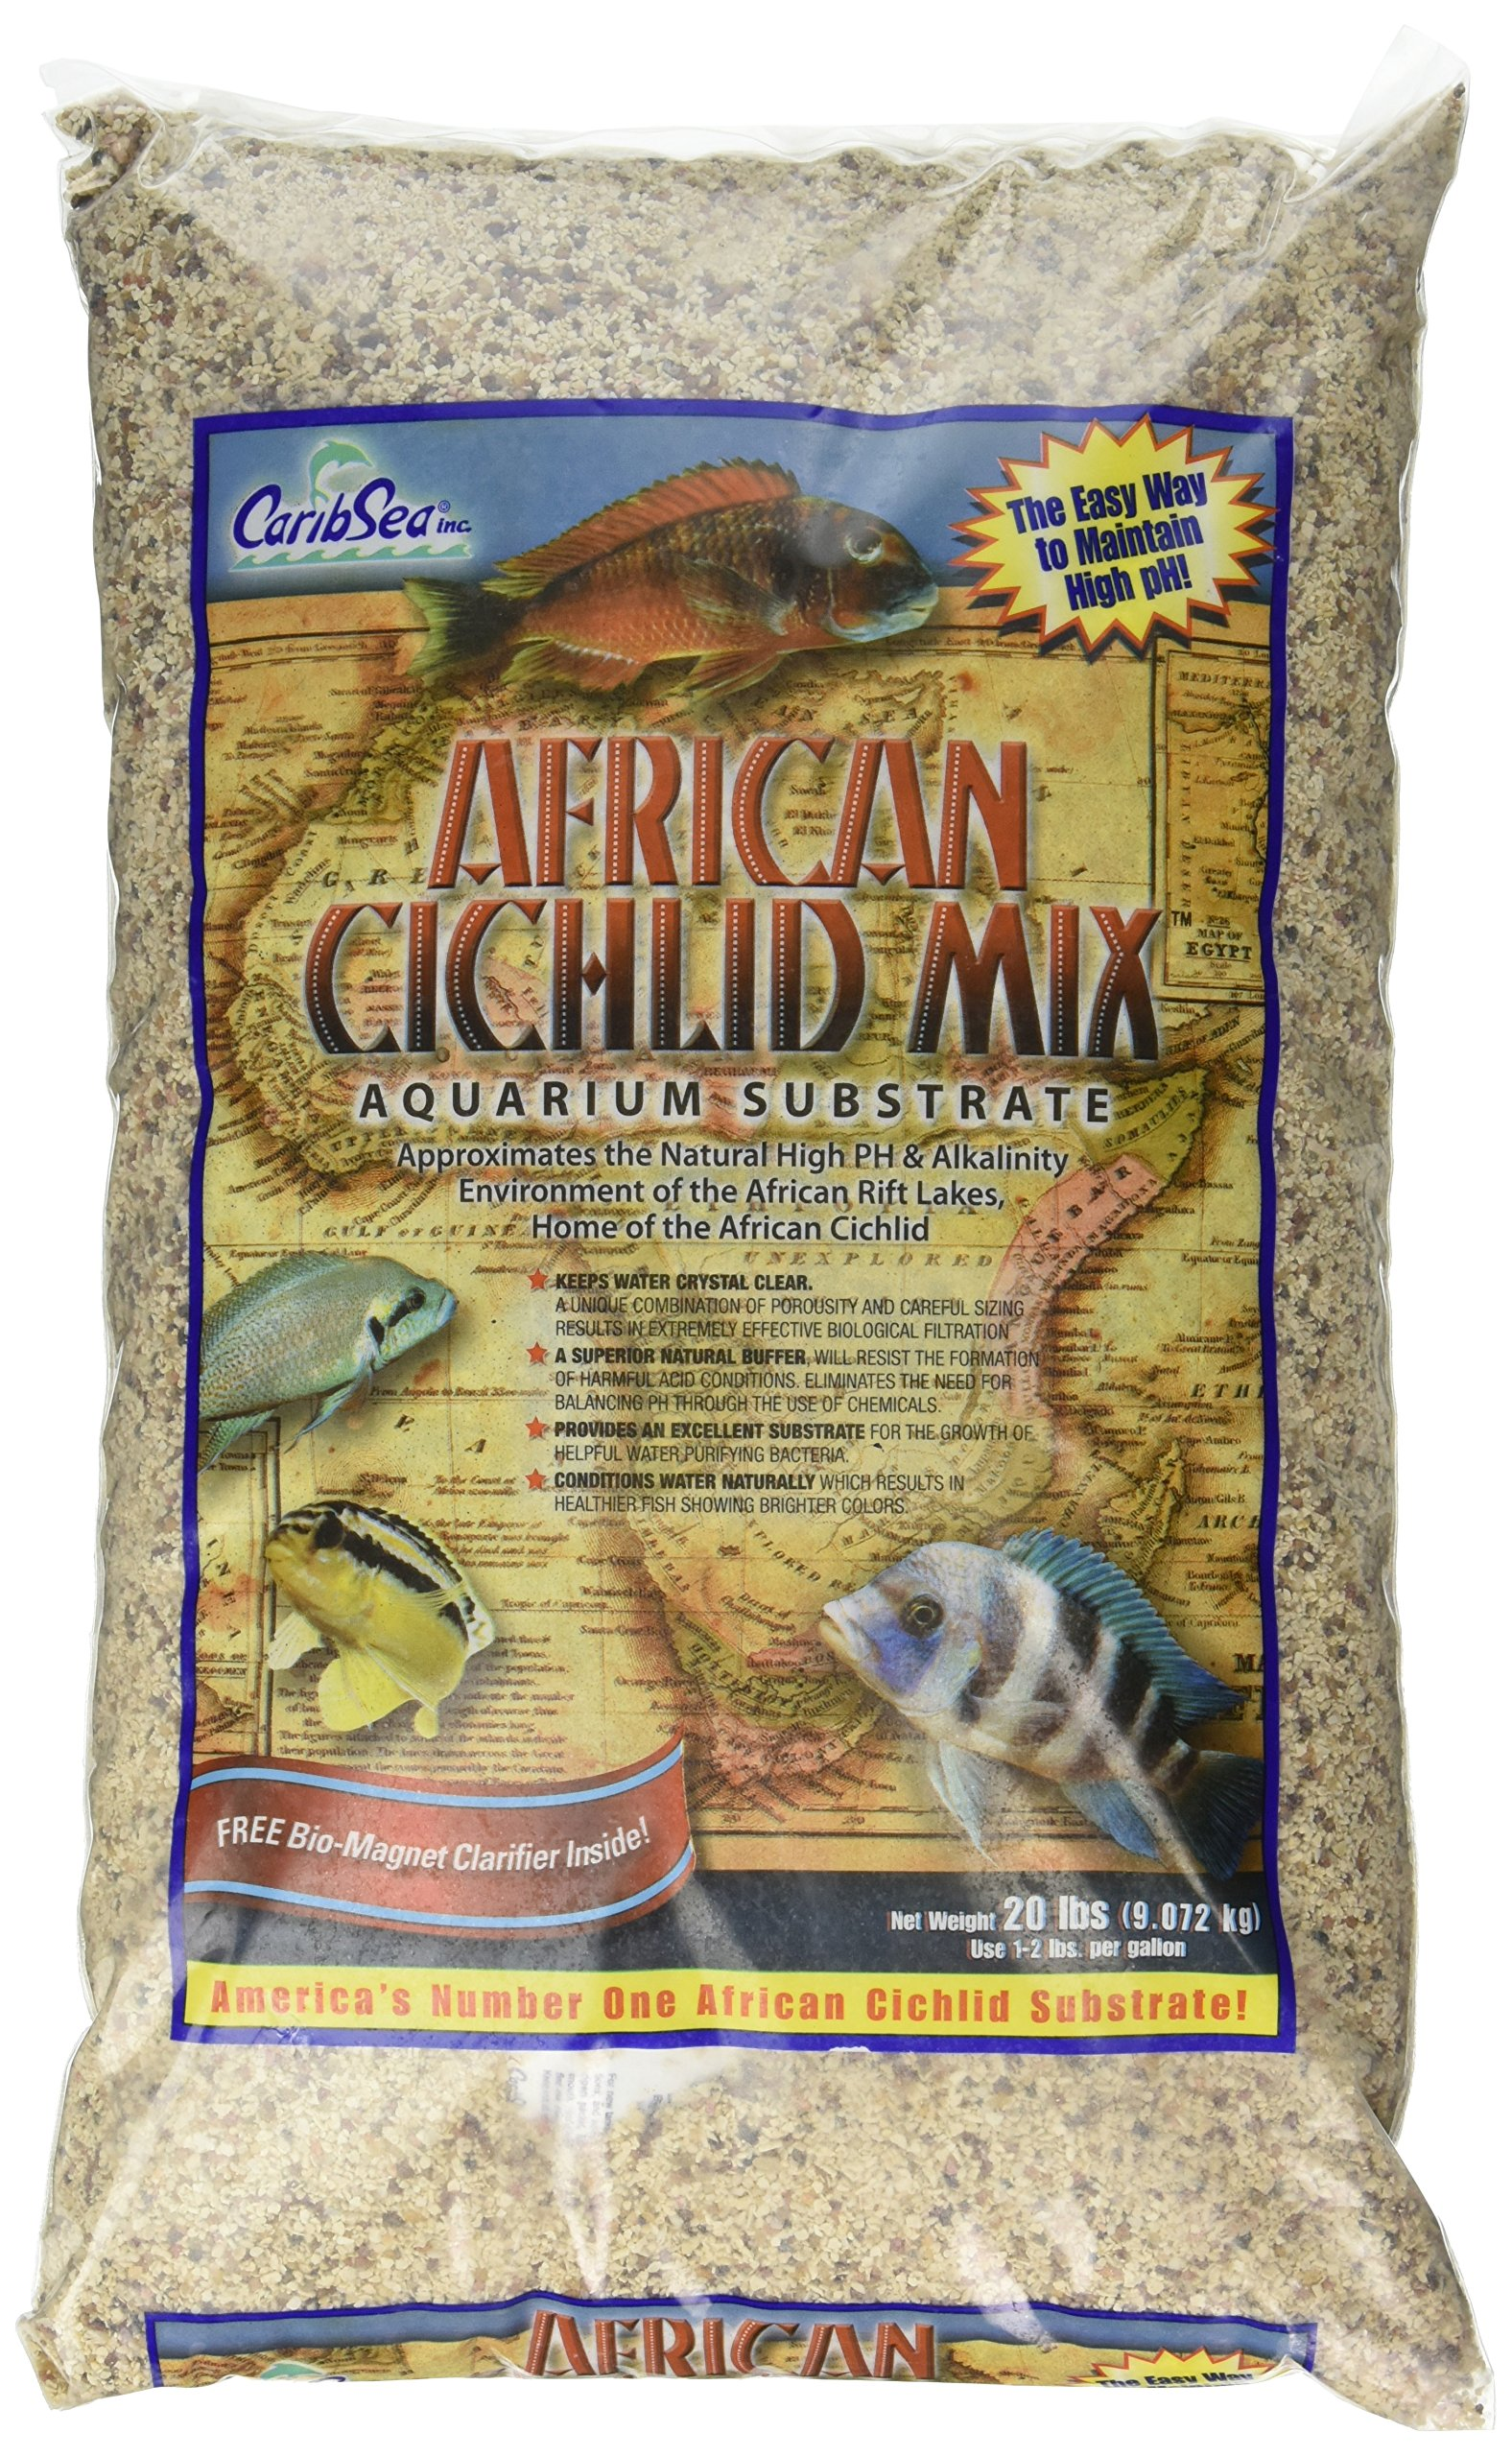 Carib Sea ACS00223 African Ivory Coast Sand for Aquarium, 20-Pound by Carib Sea